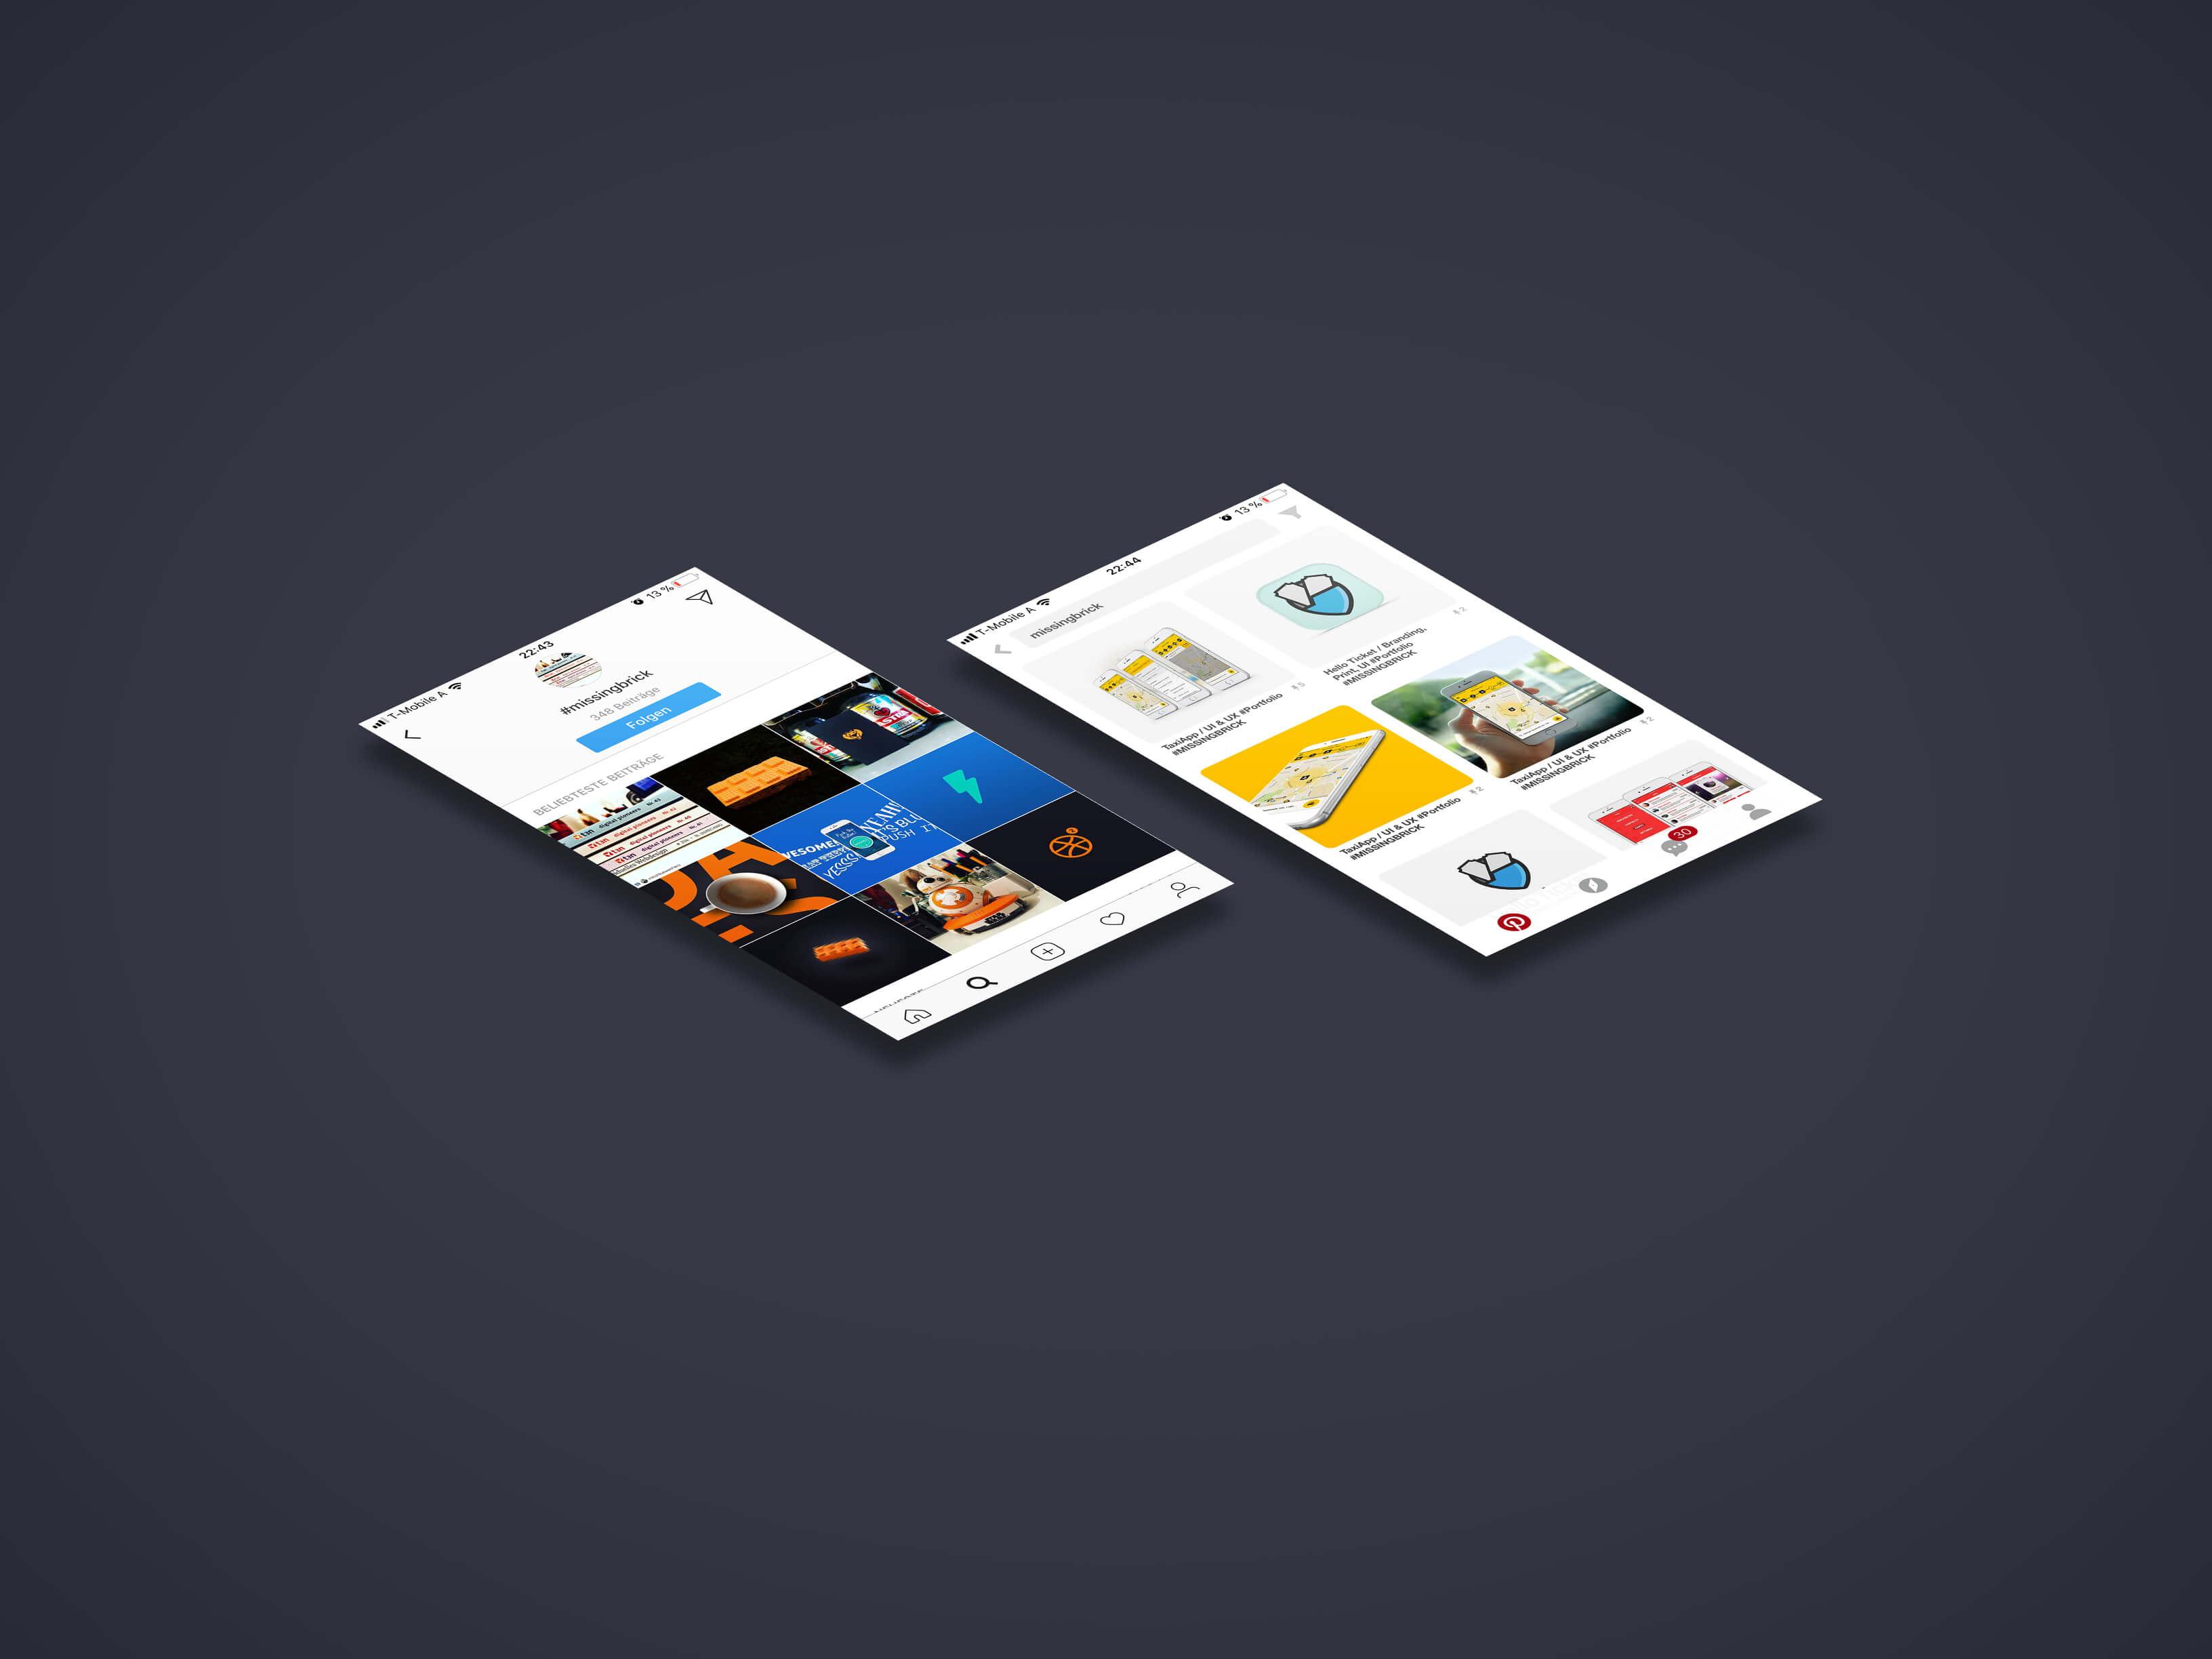 missingbrick-App-Mockup